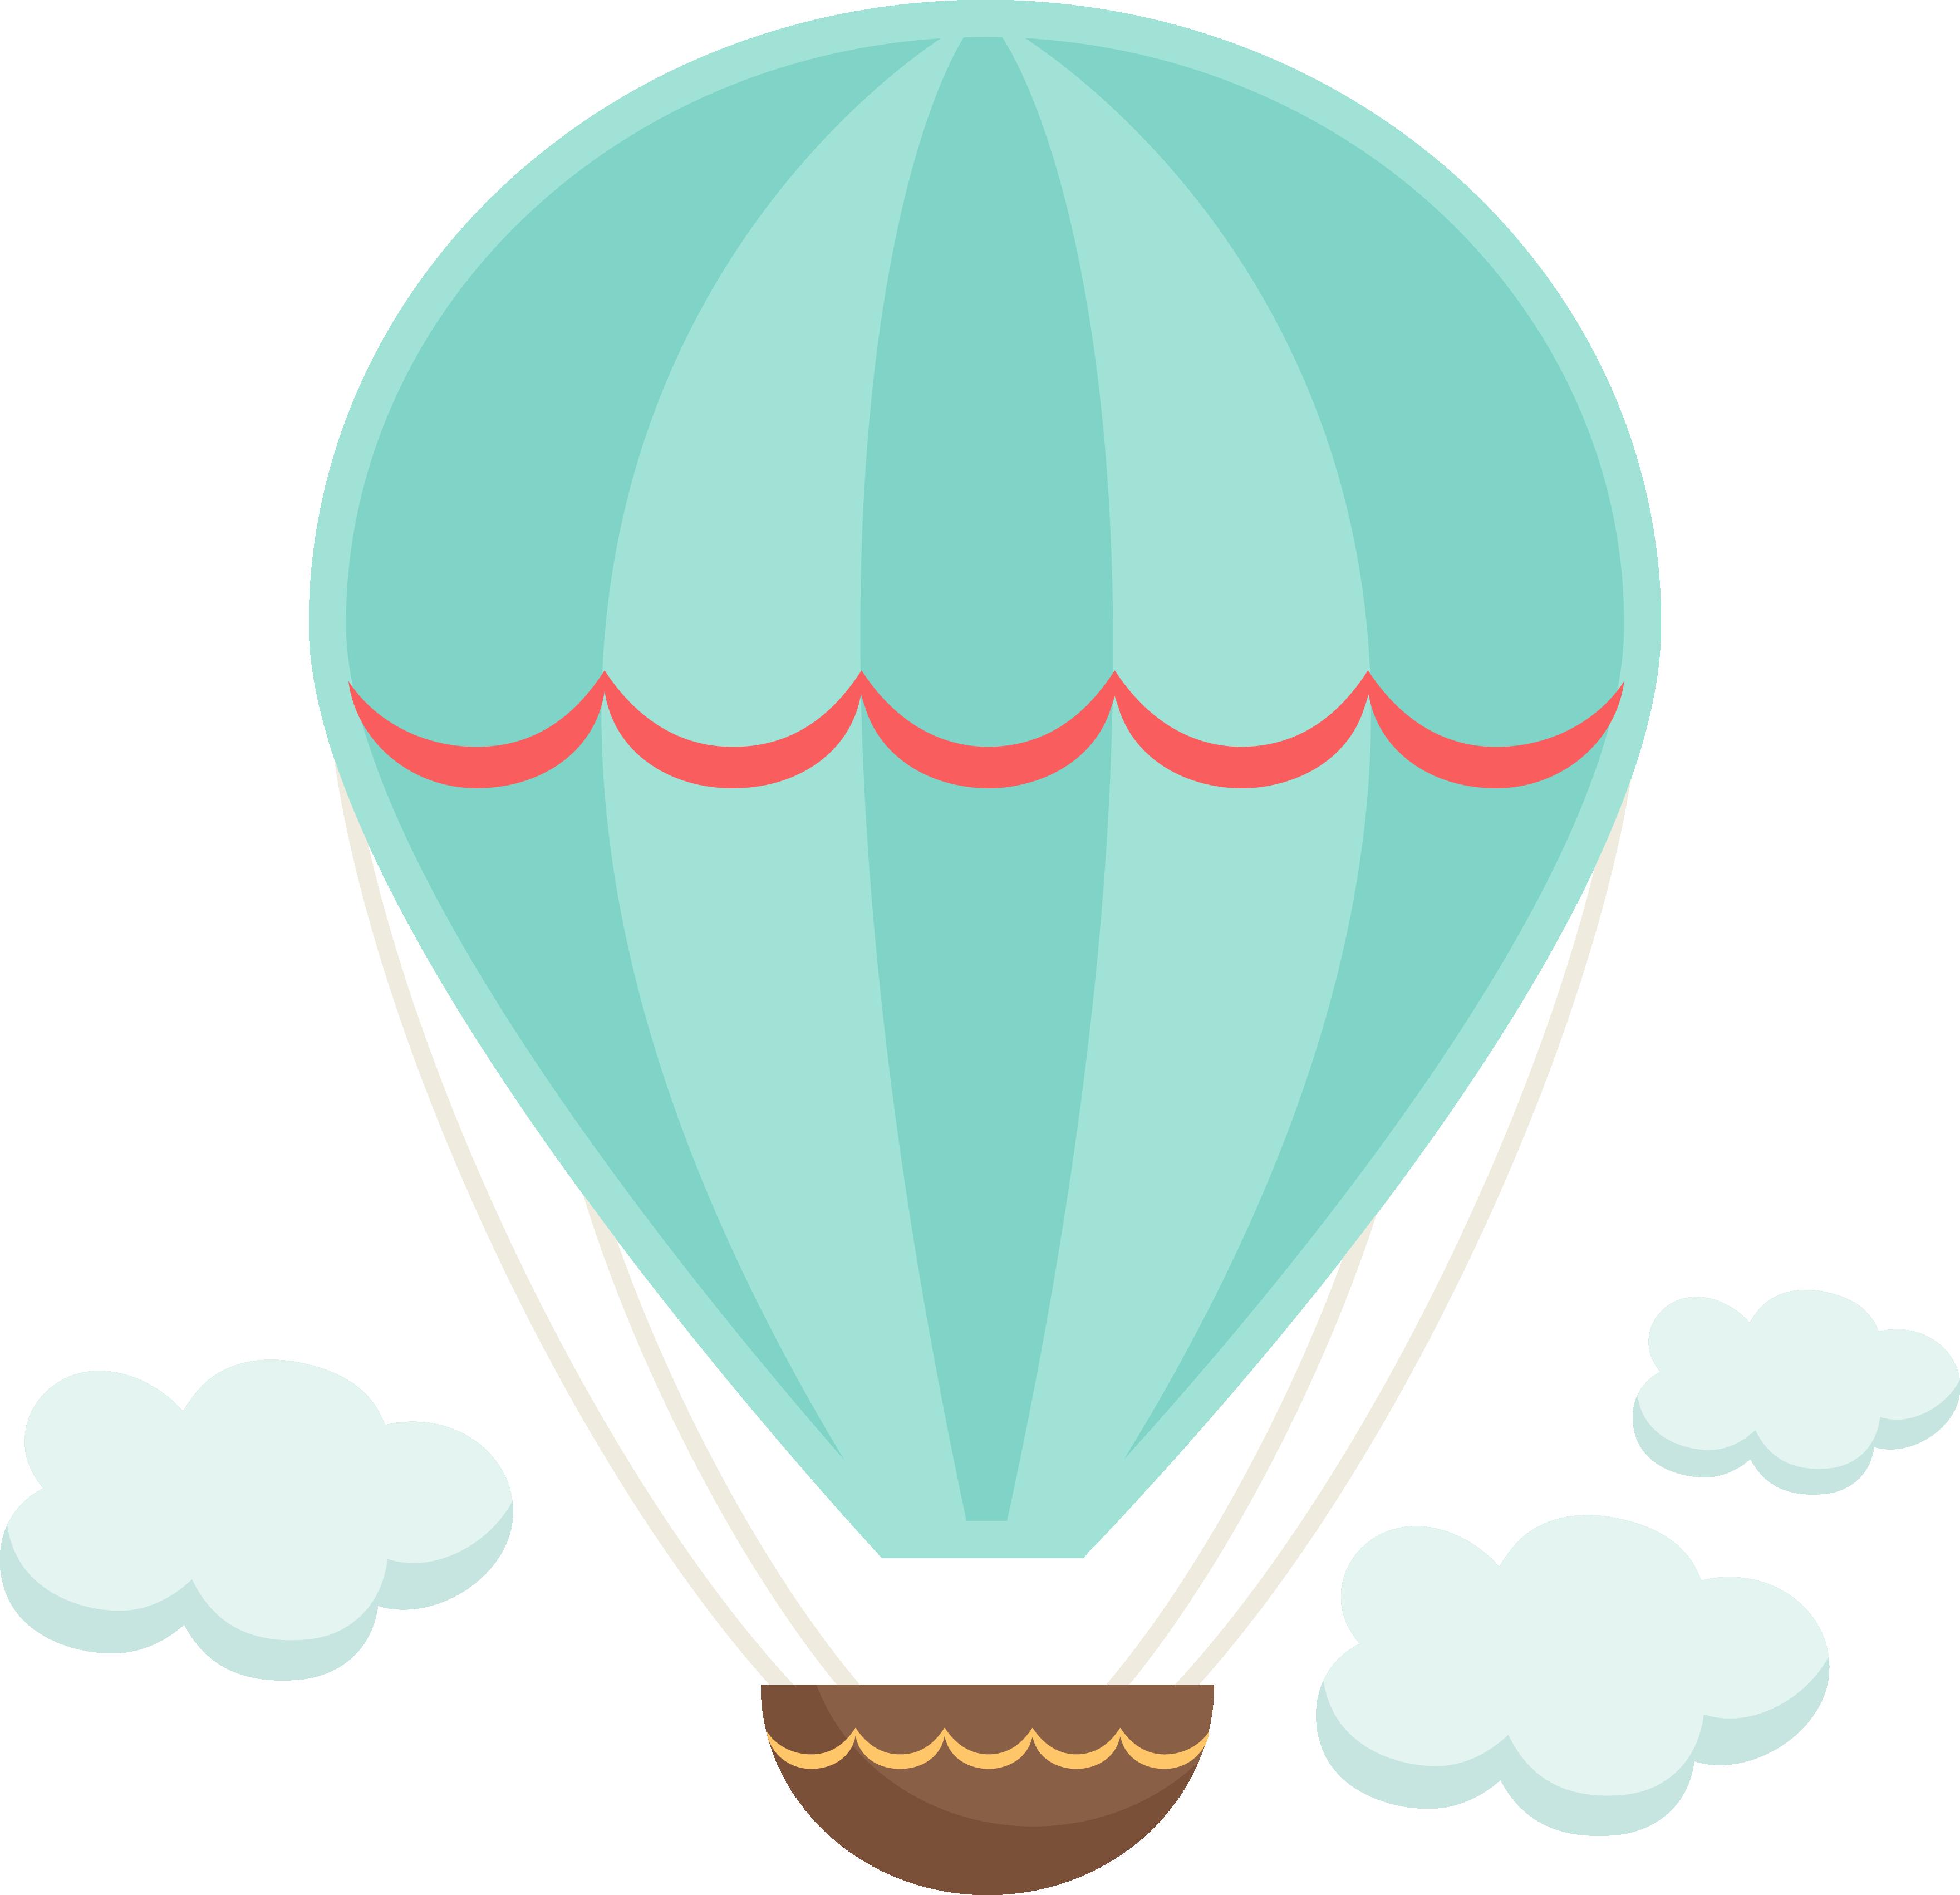 Clipart balloons vintage. Hot air balloon scrapbooking